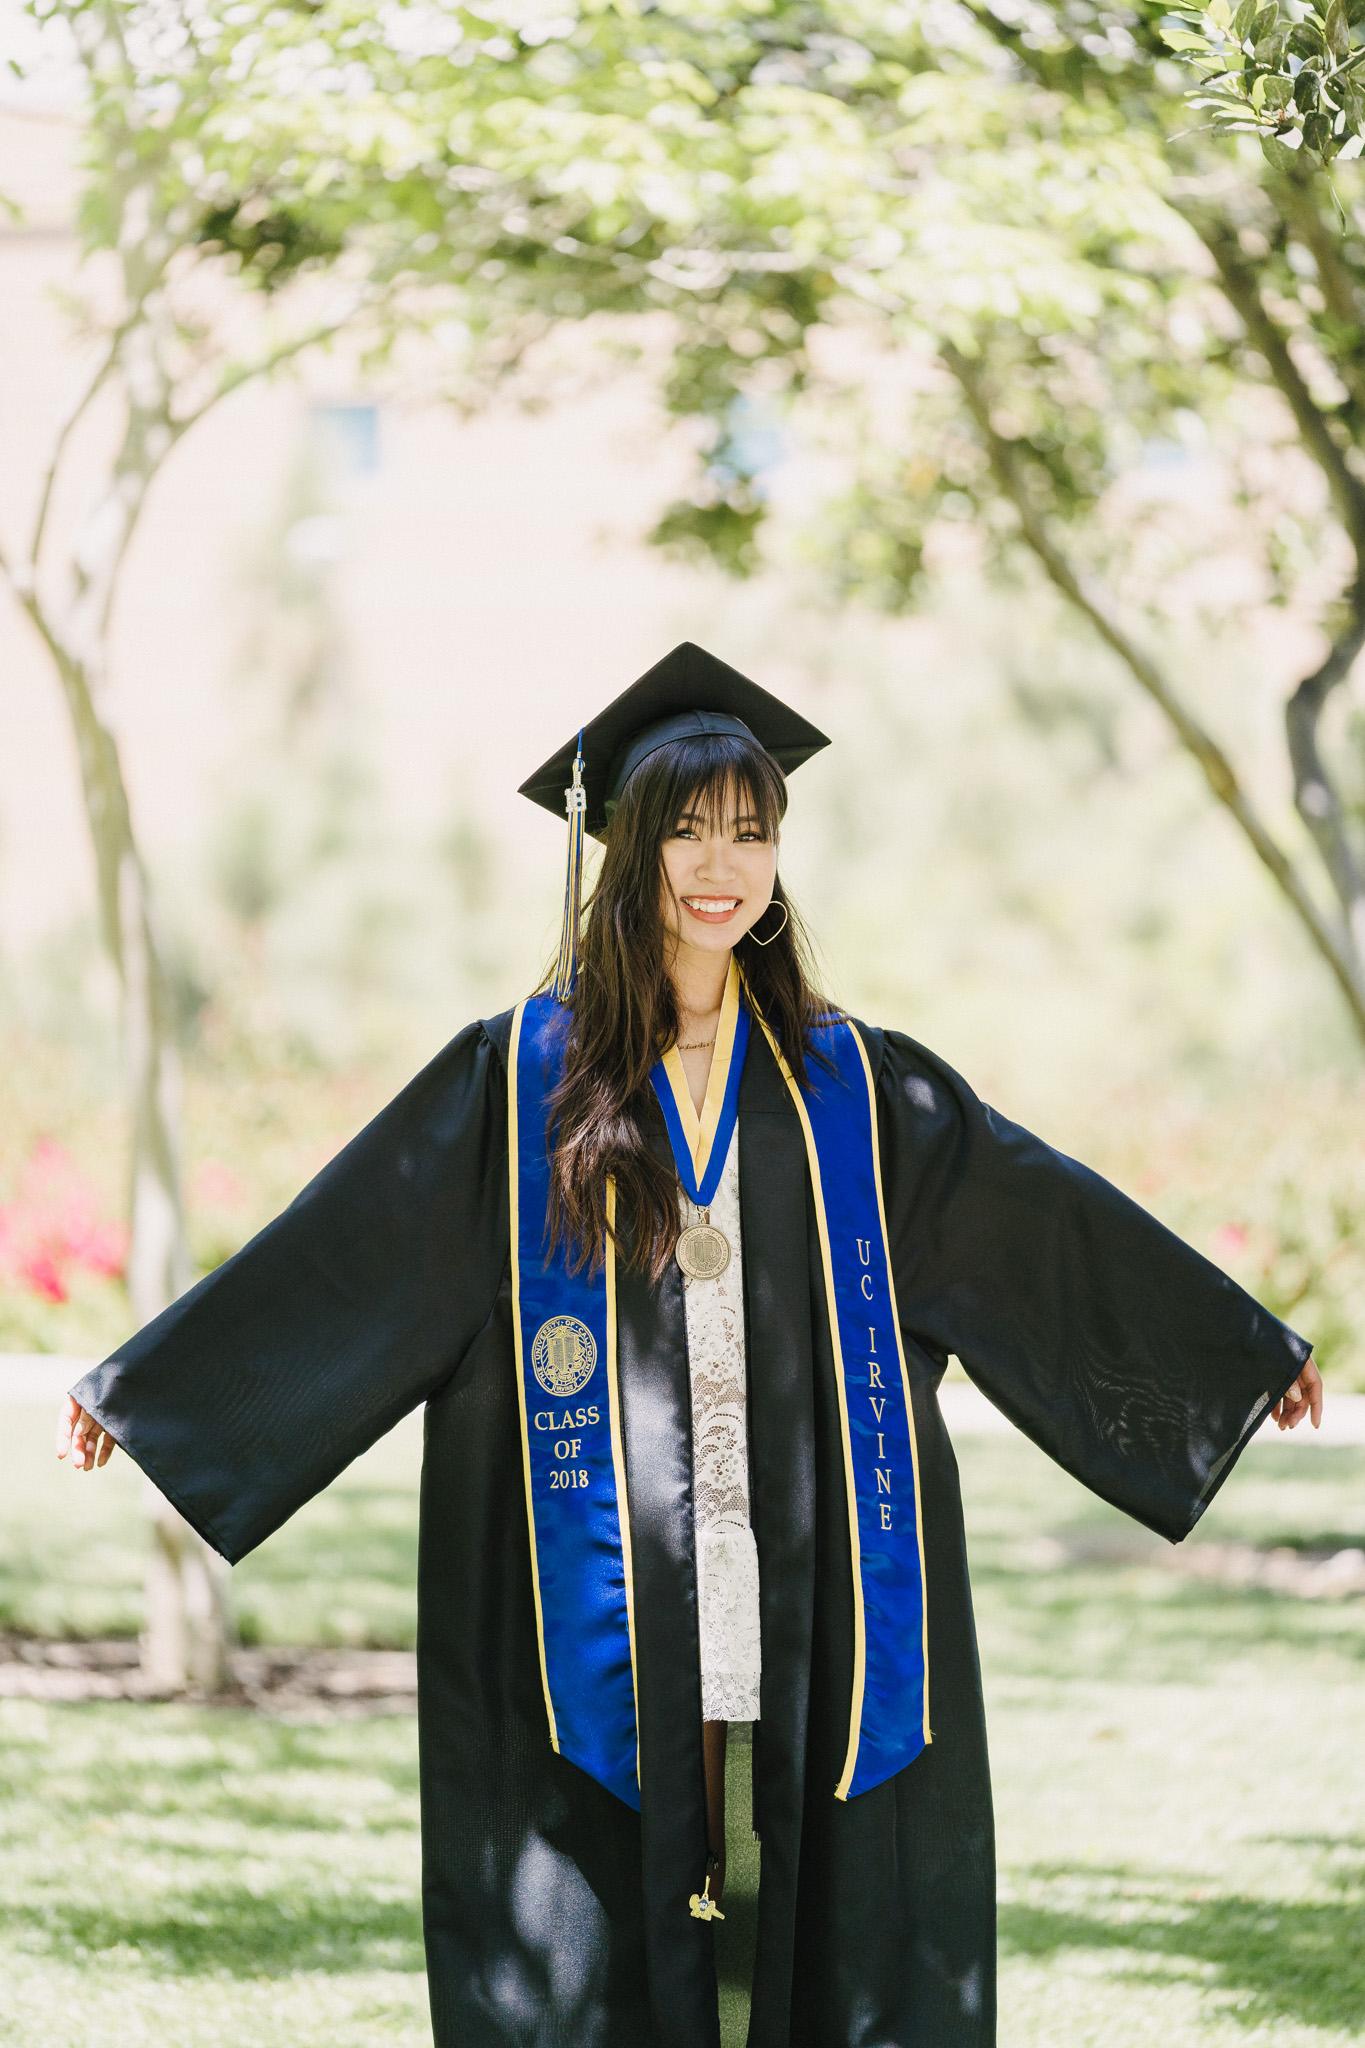 [5-16-2018] Vi's Graduation Photoshoot155.jpg